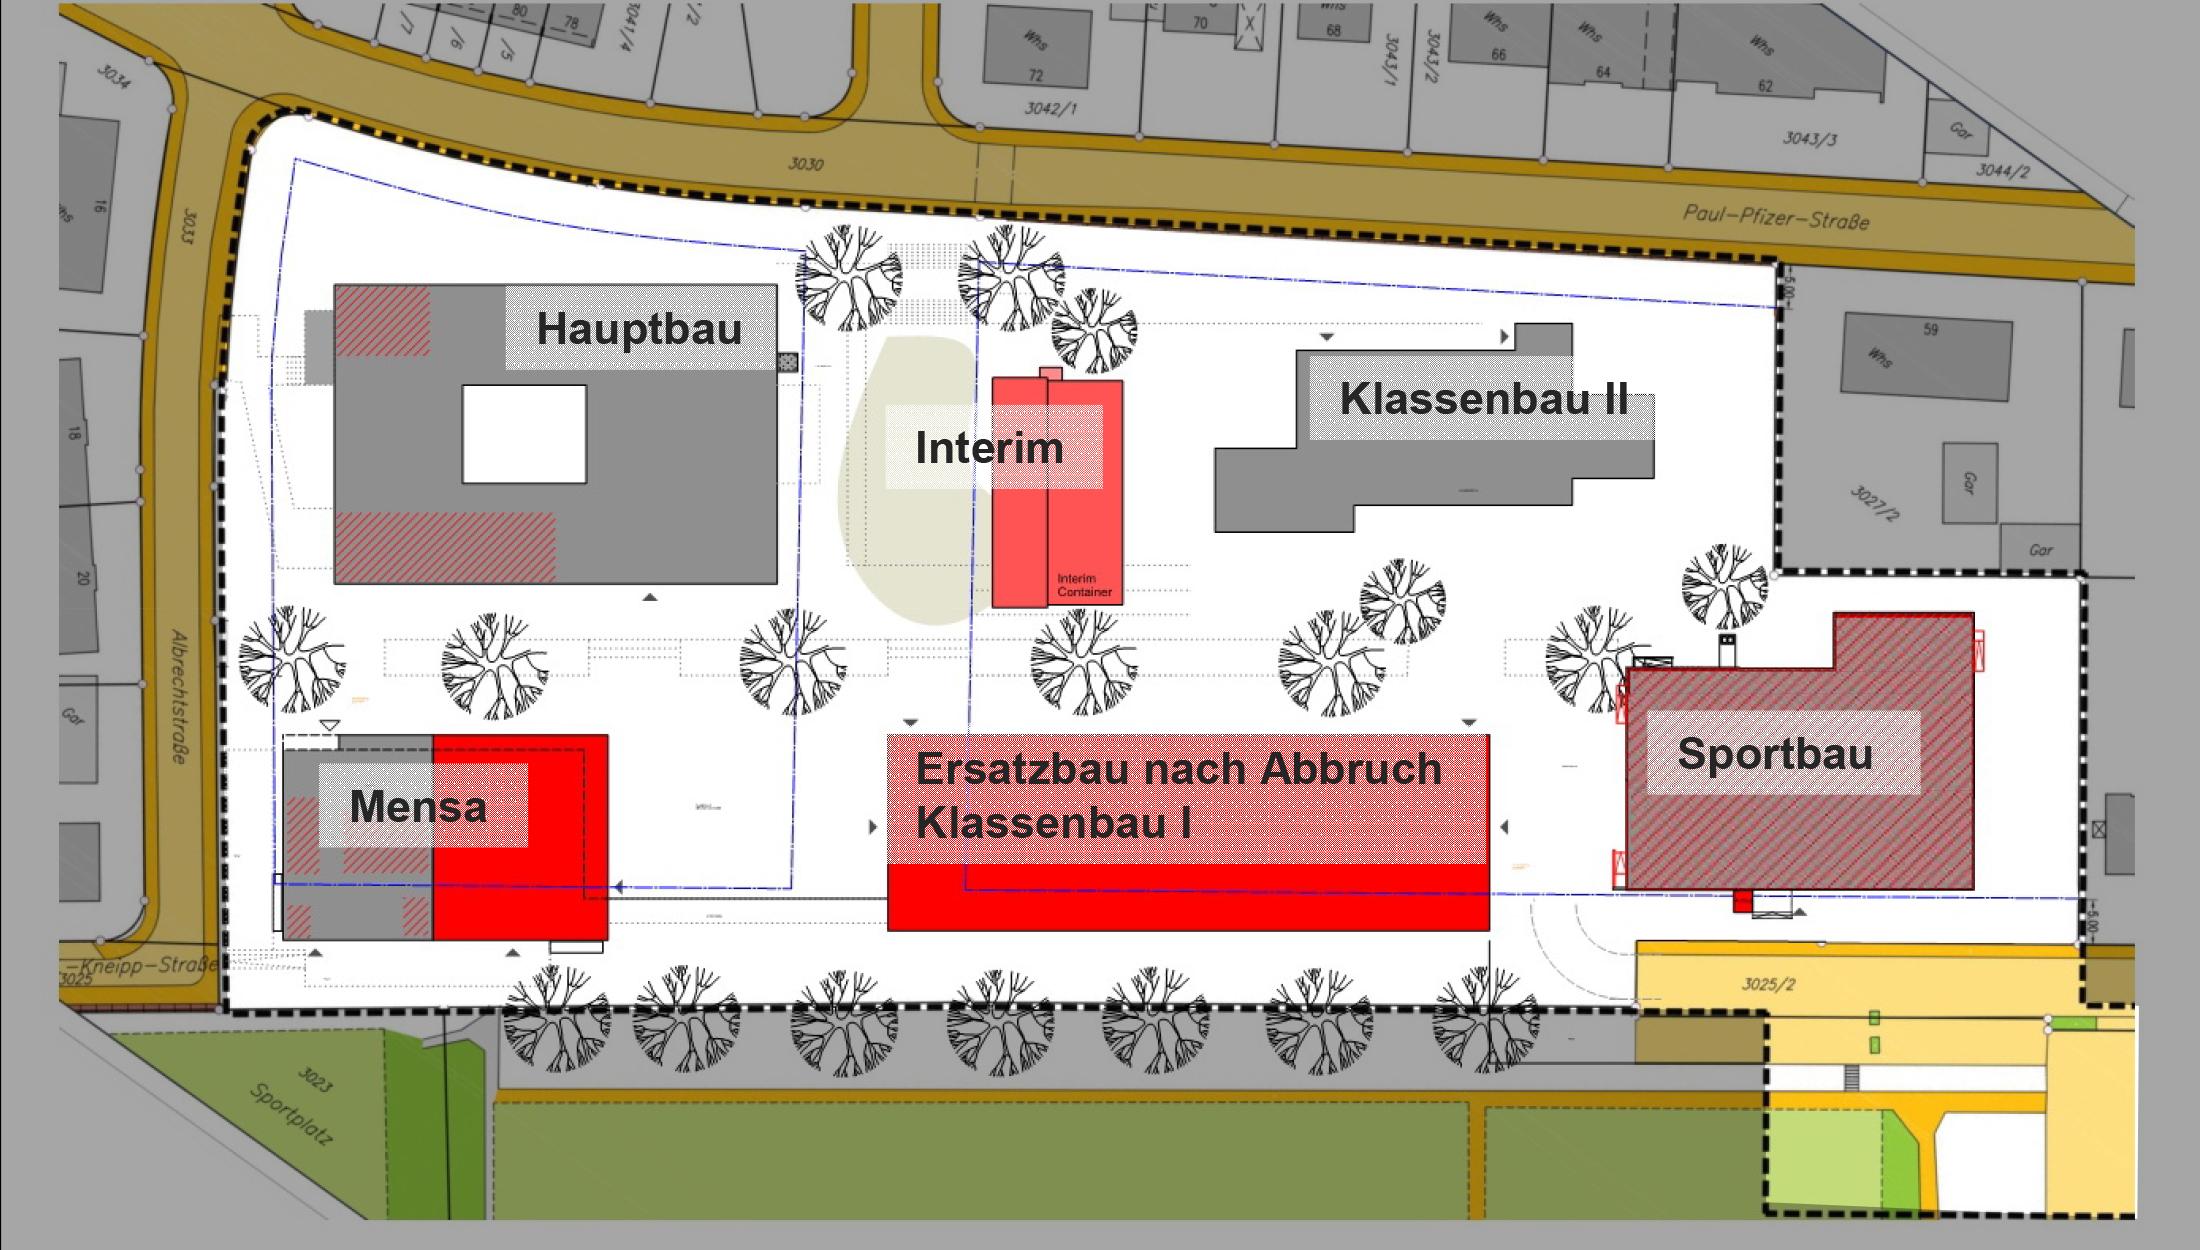 2019, Verfahrensbetreuung Sanierung des Sportbaus an der Eduard-Spranger-Schule, Reutlingen